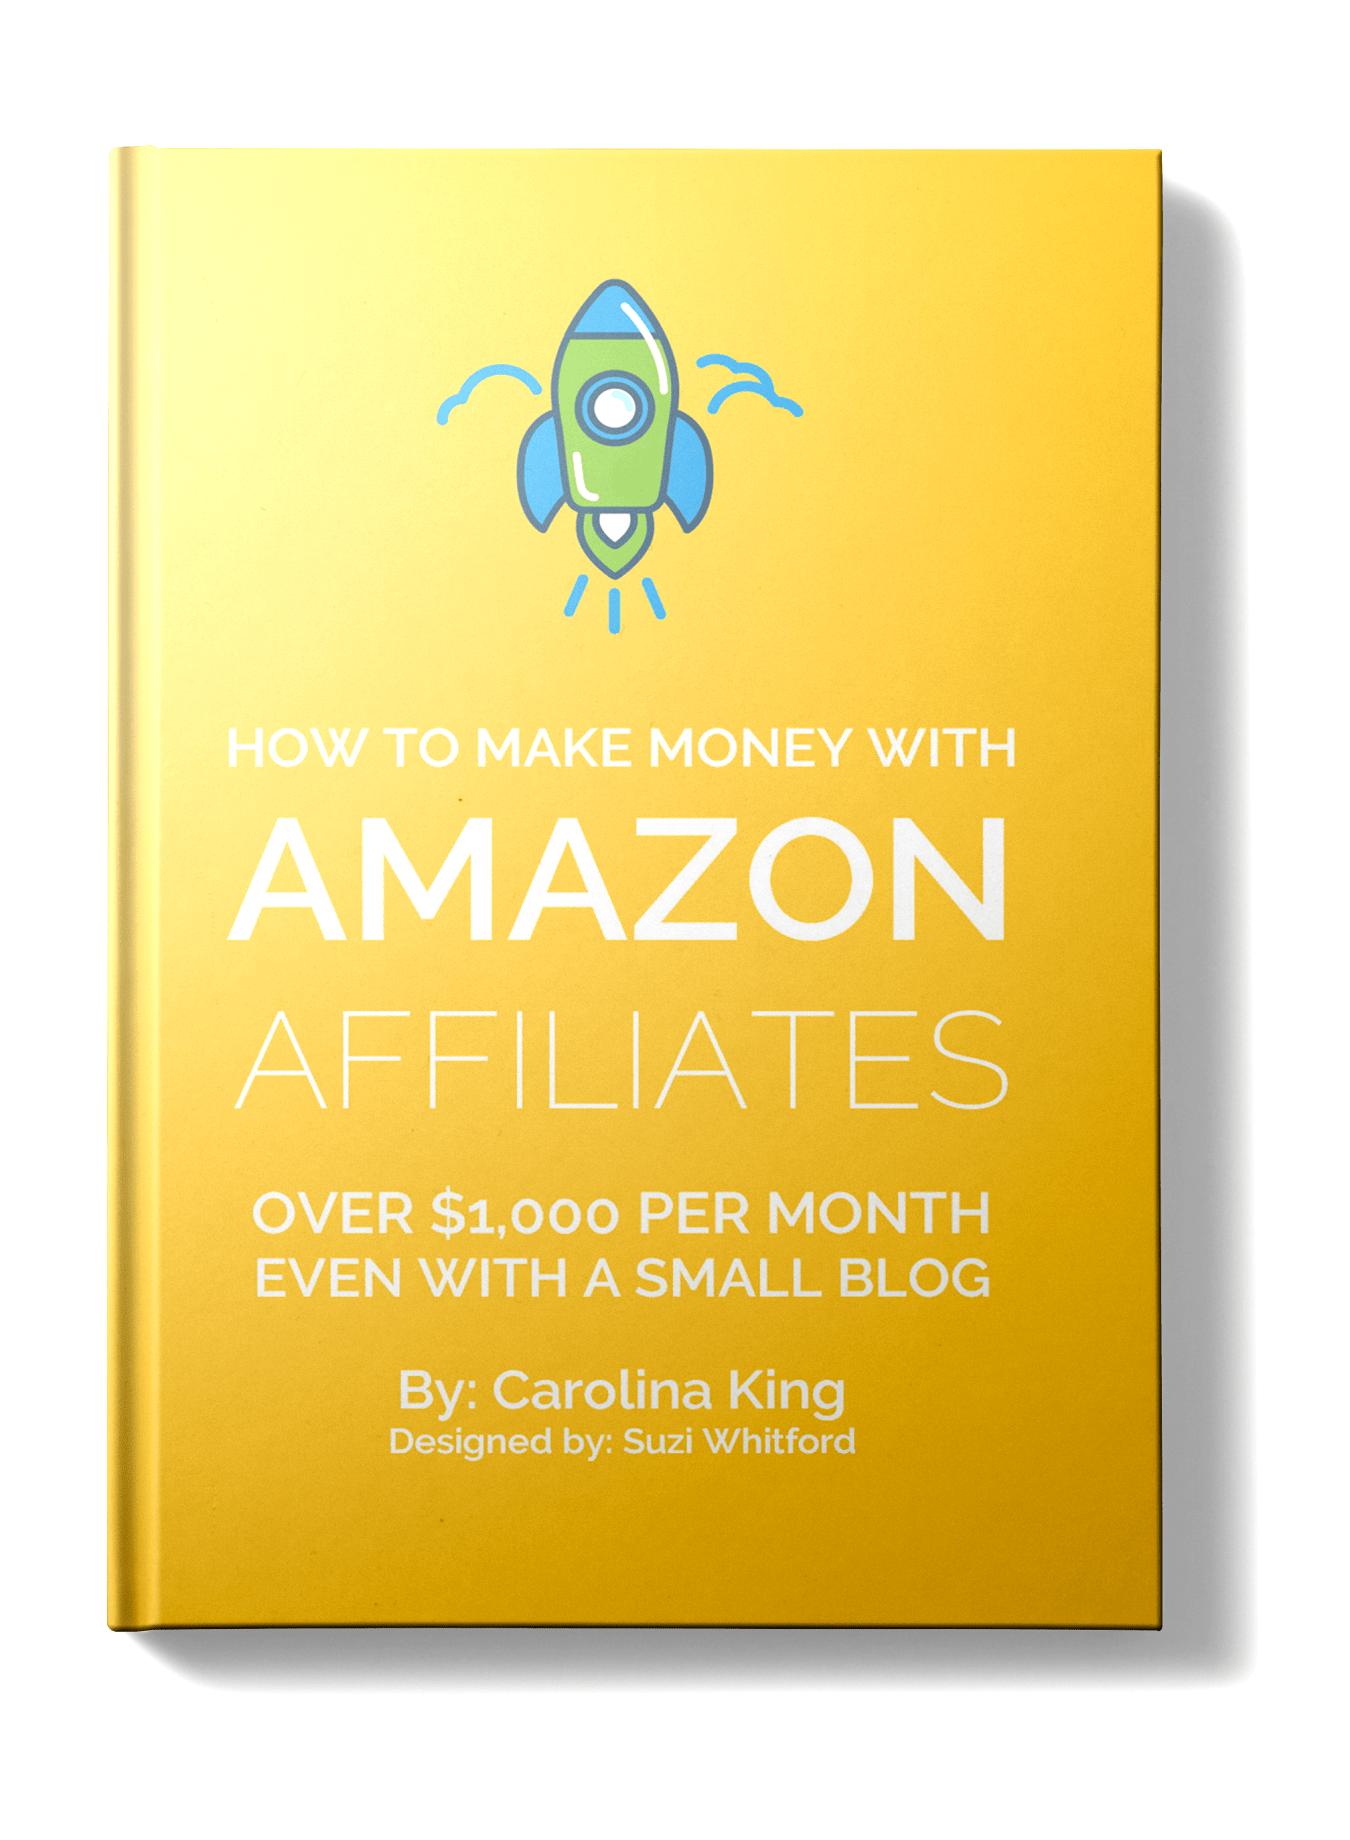 Amazon Affiliates E-book